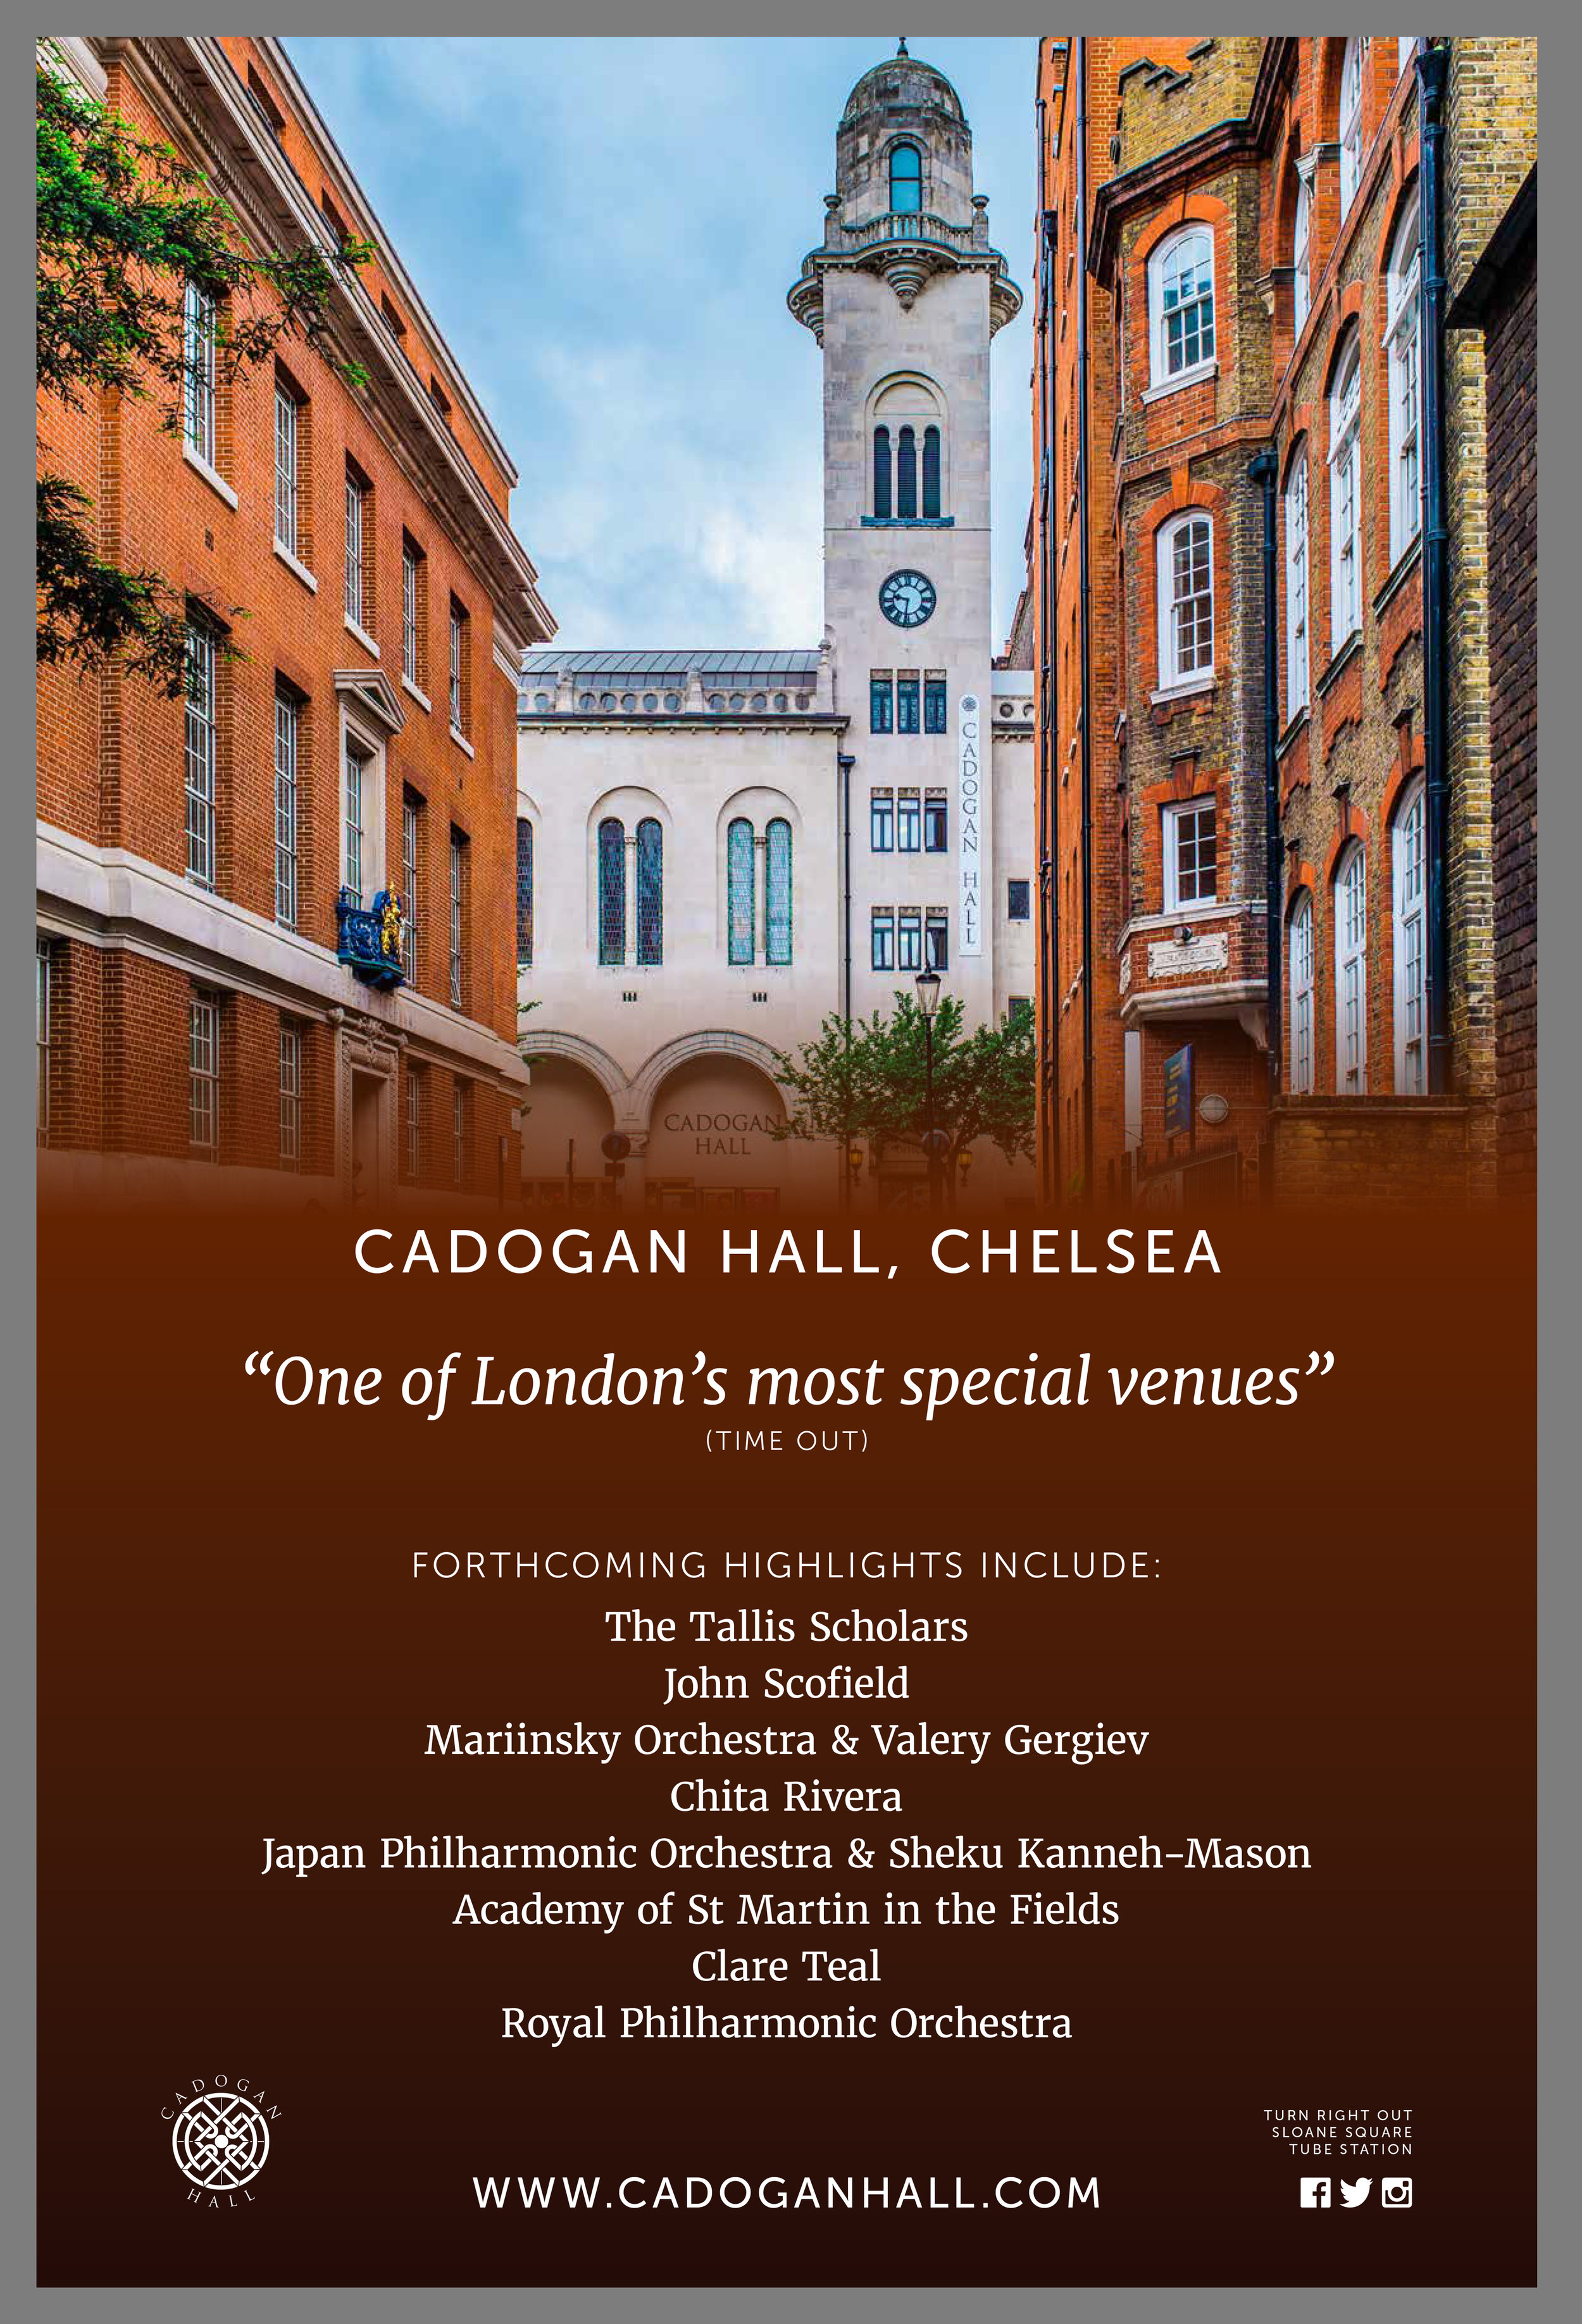 Cad Hall Poster 2.jpg